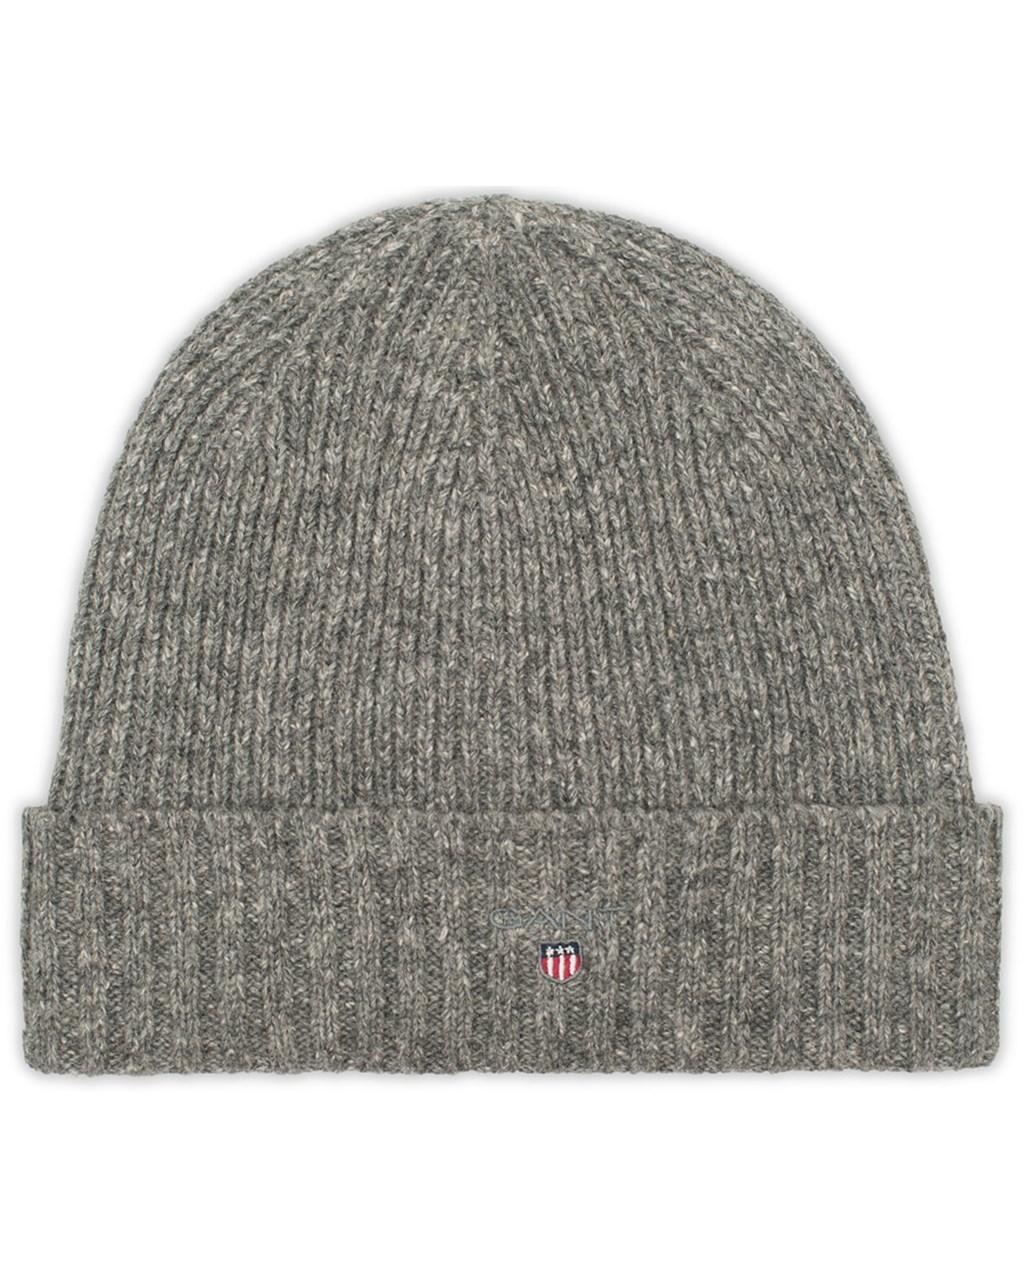 5dcbb51c649 Wool Lined Beanie Dark Grey Melange